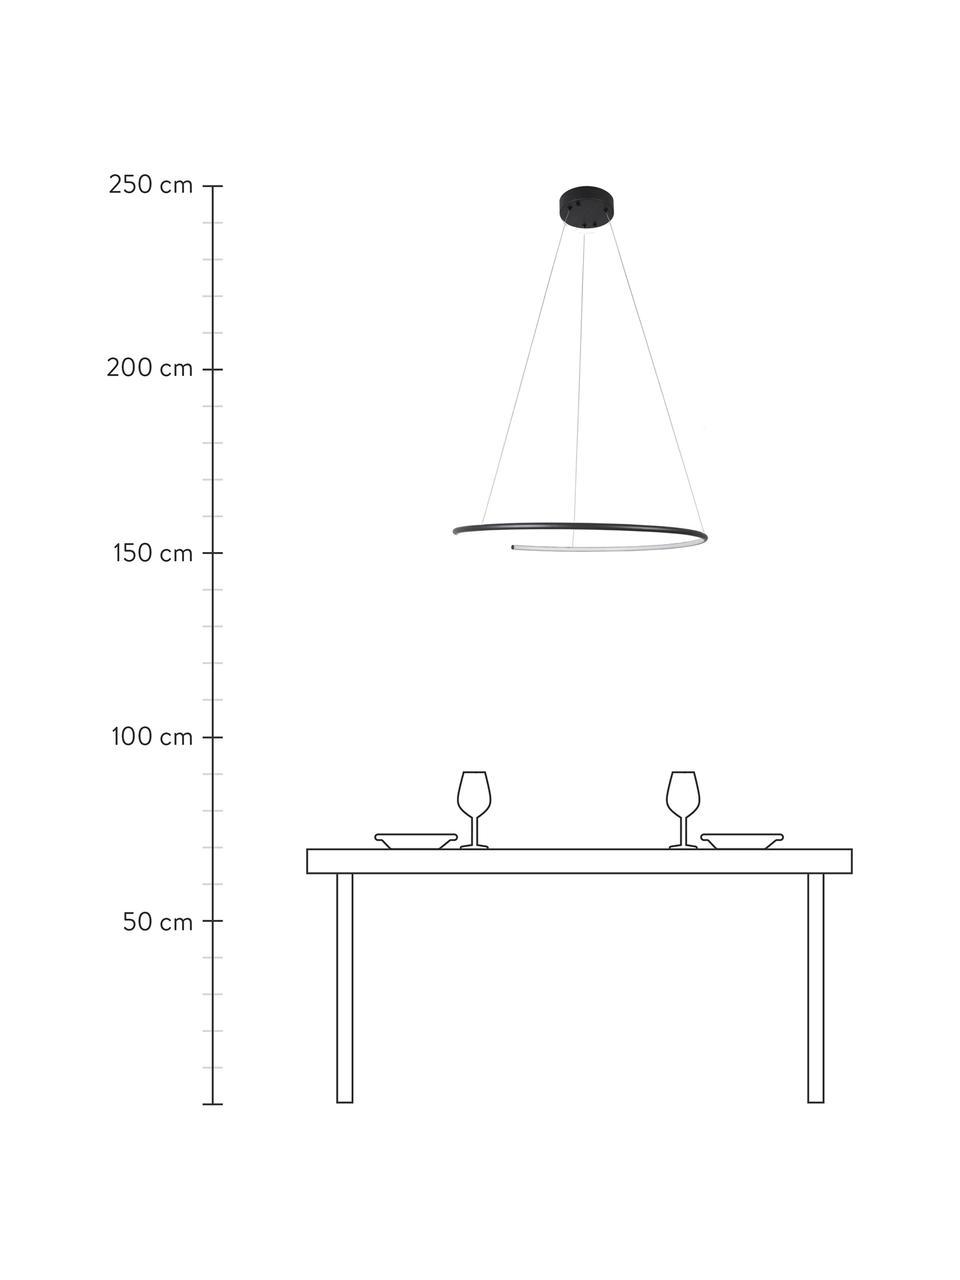 Große LED-Pendelleuchte Breda in Schwarz, Lampenschirm: Aluminium, Baldachin: Aluminium, Schwarz, Ø 70 x H 200 cm